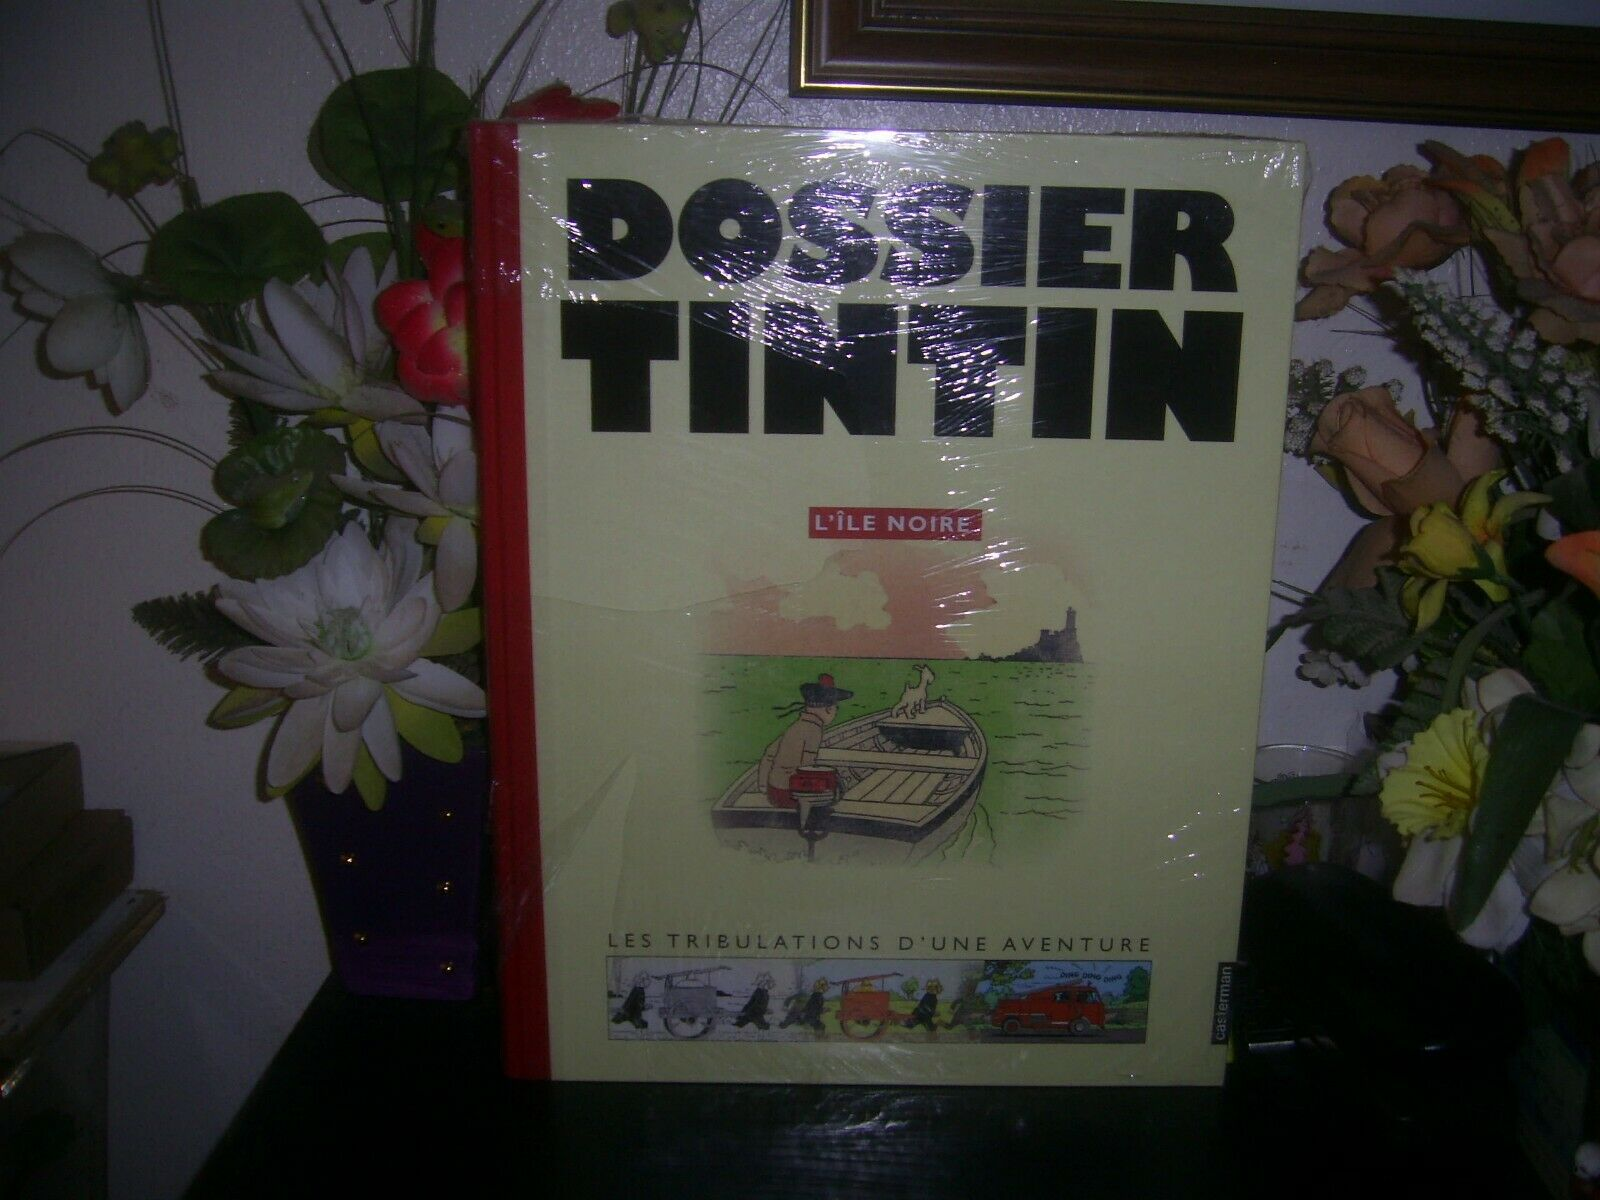 TINTIN  -  DOSSIER TINTIN  -  L 'ILE NOIRE   -  HERGE